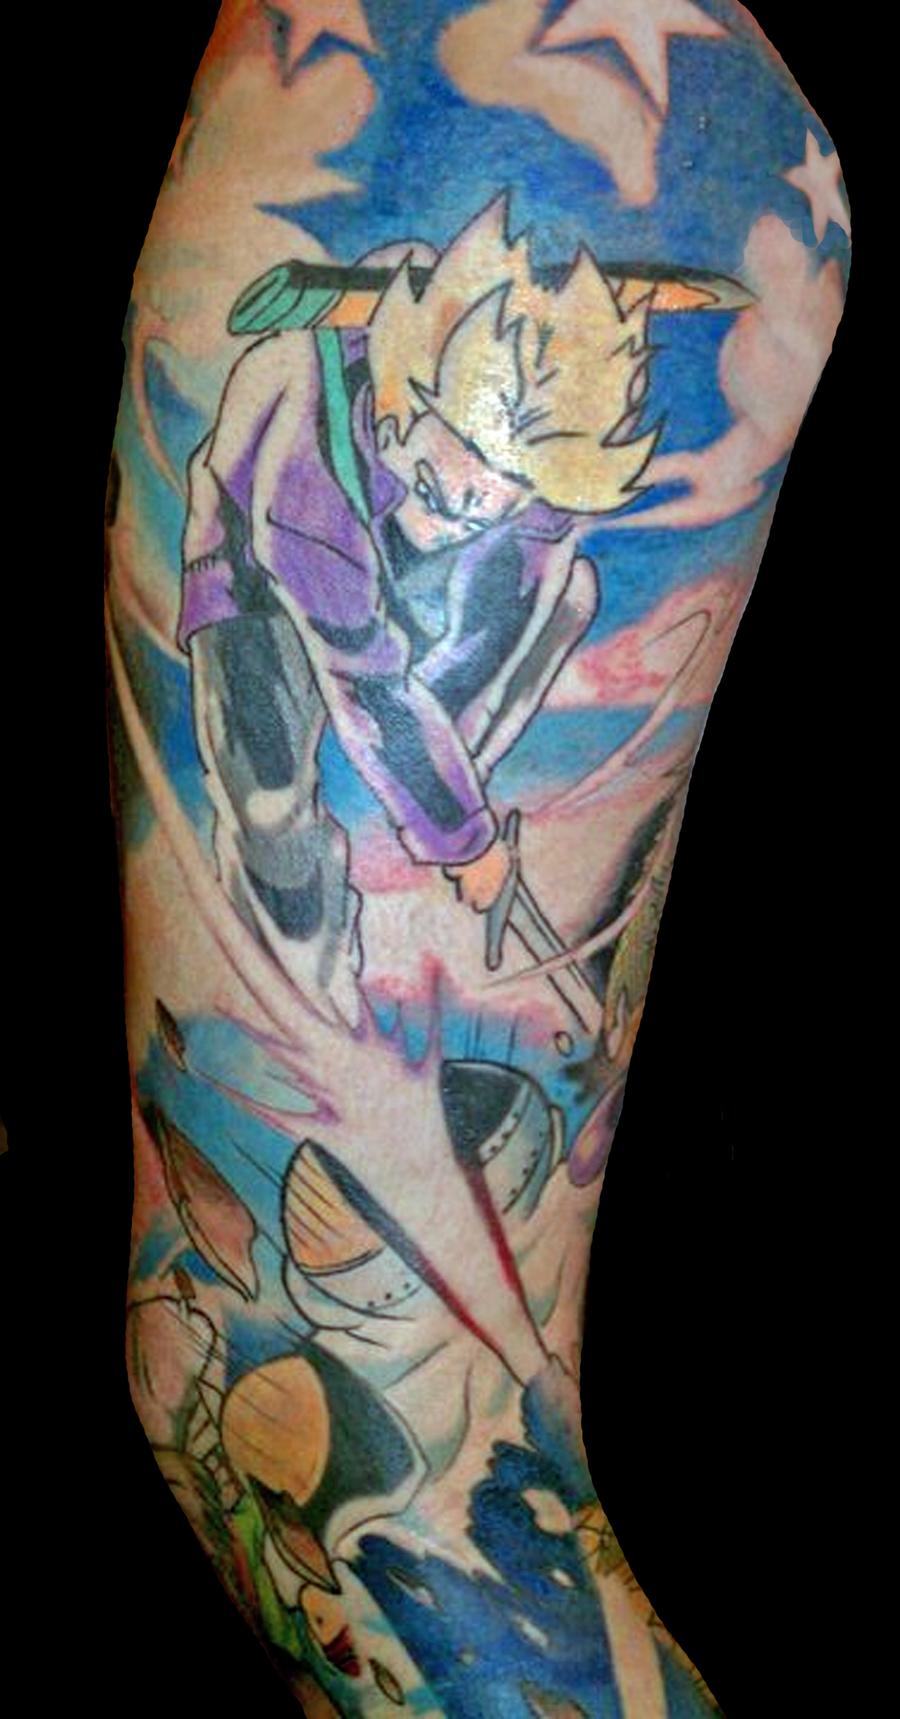 Dragon ball z tattoo gallery